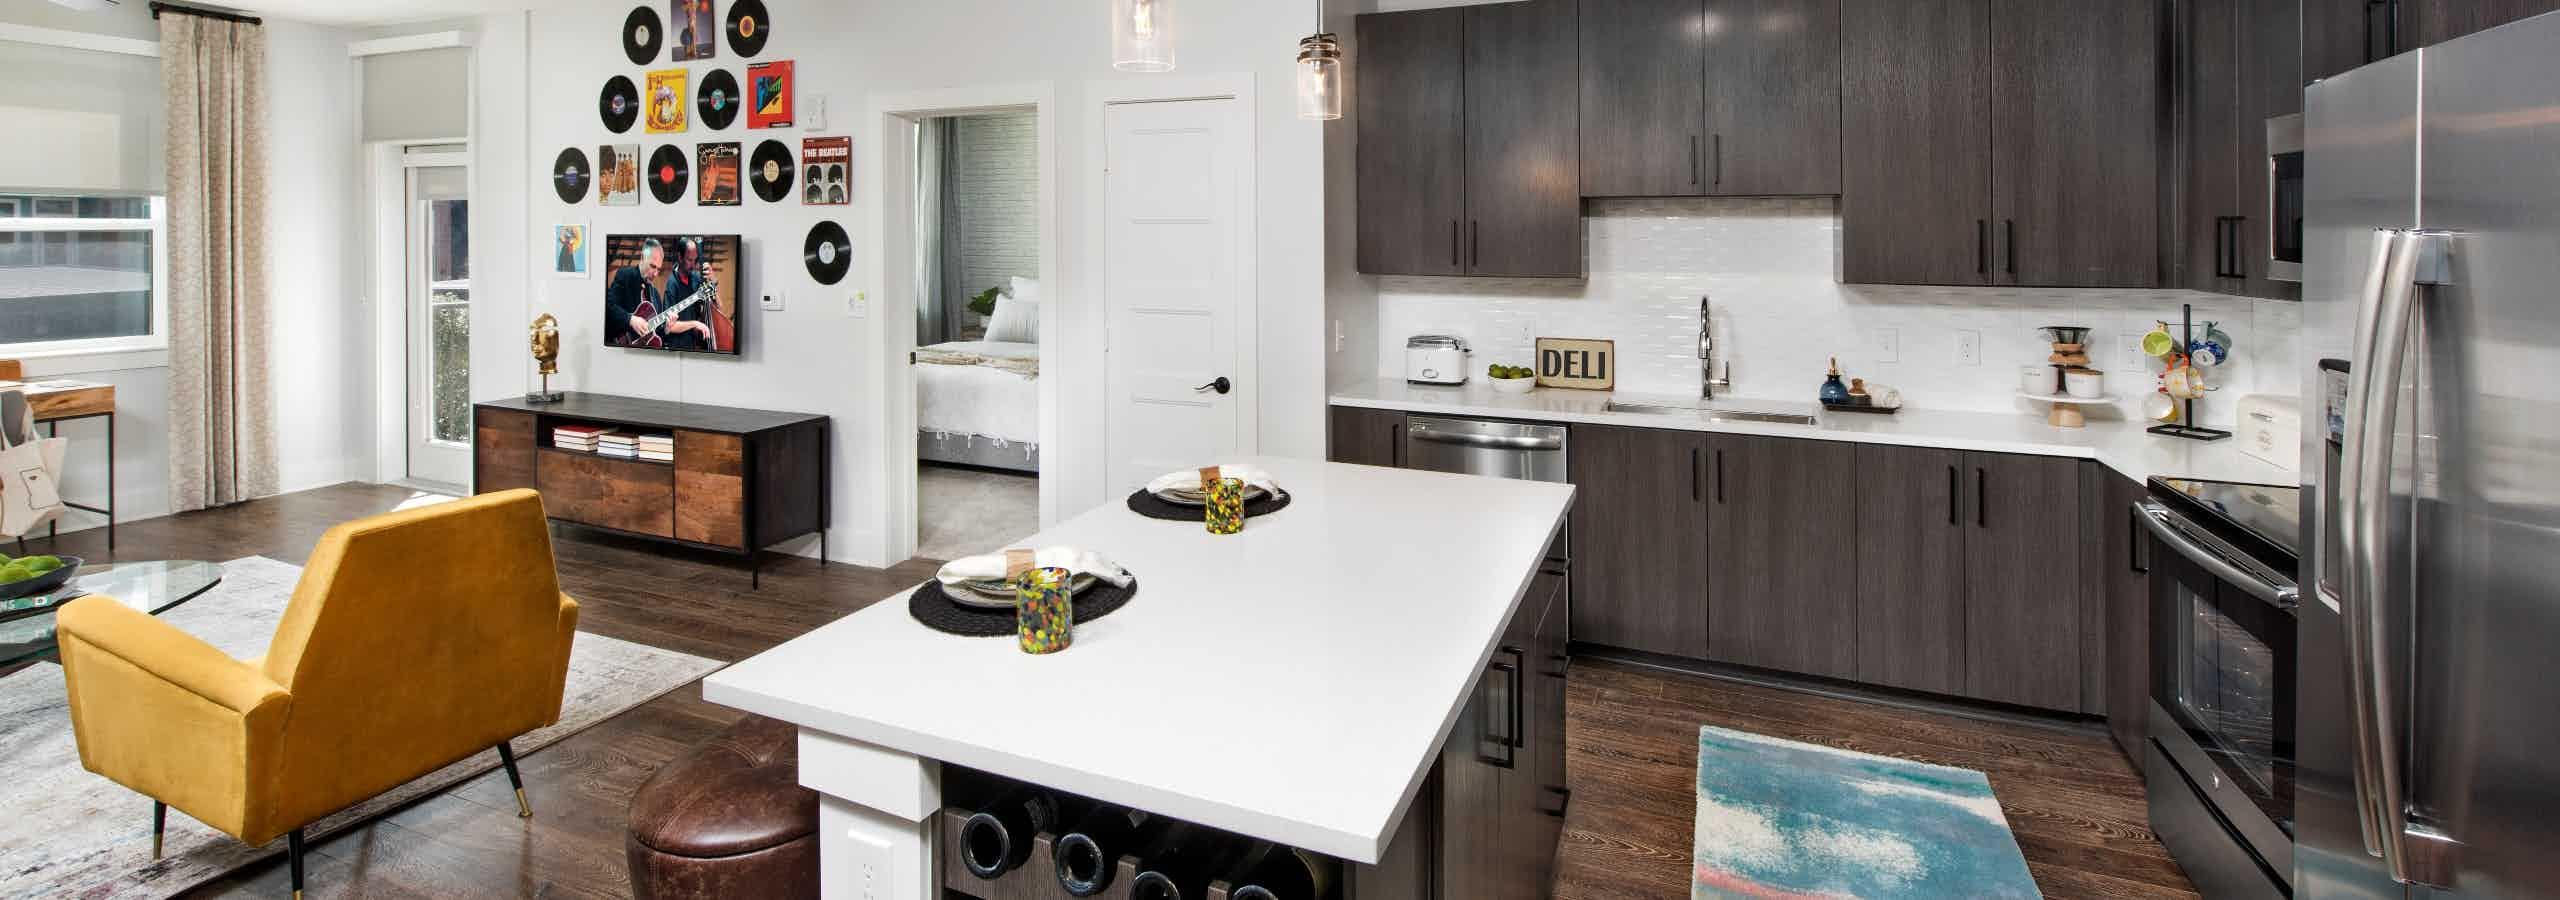 Island kitchen with bala 3cm quartz countertops